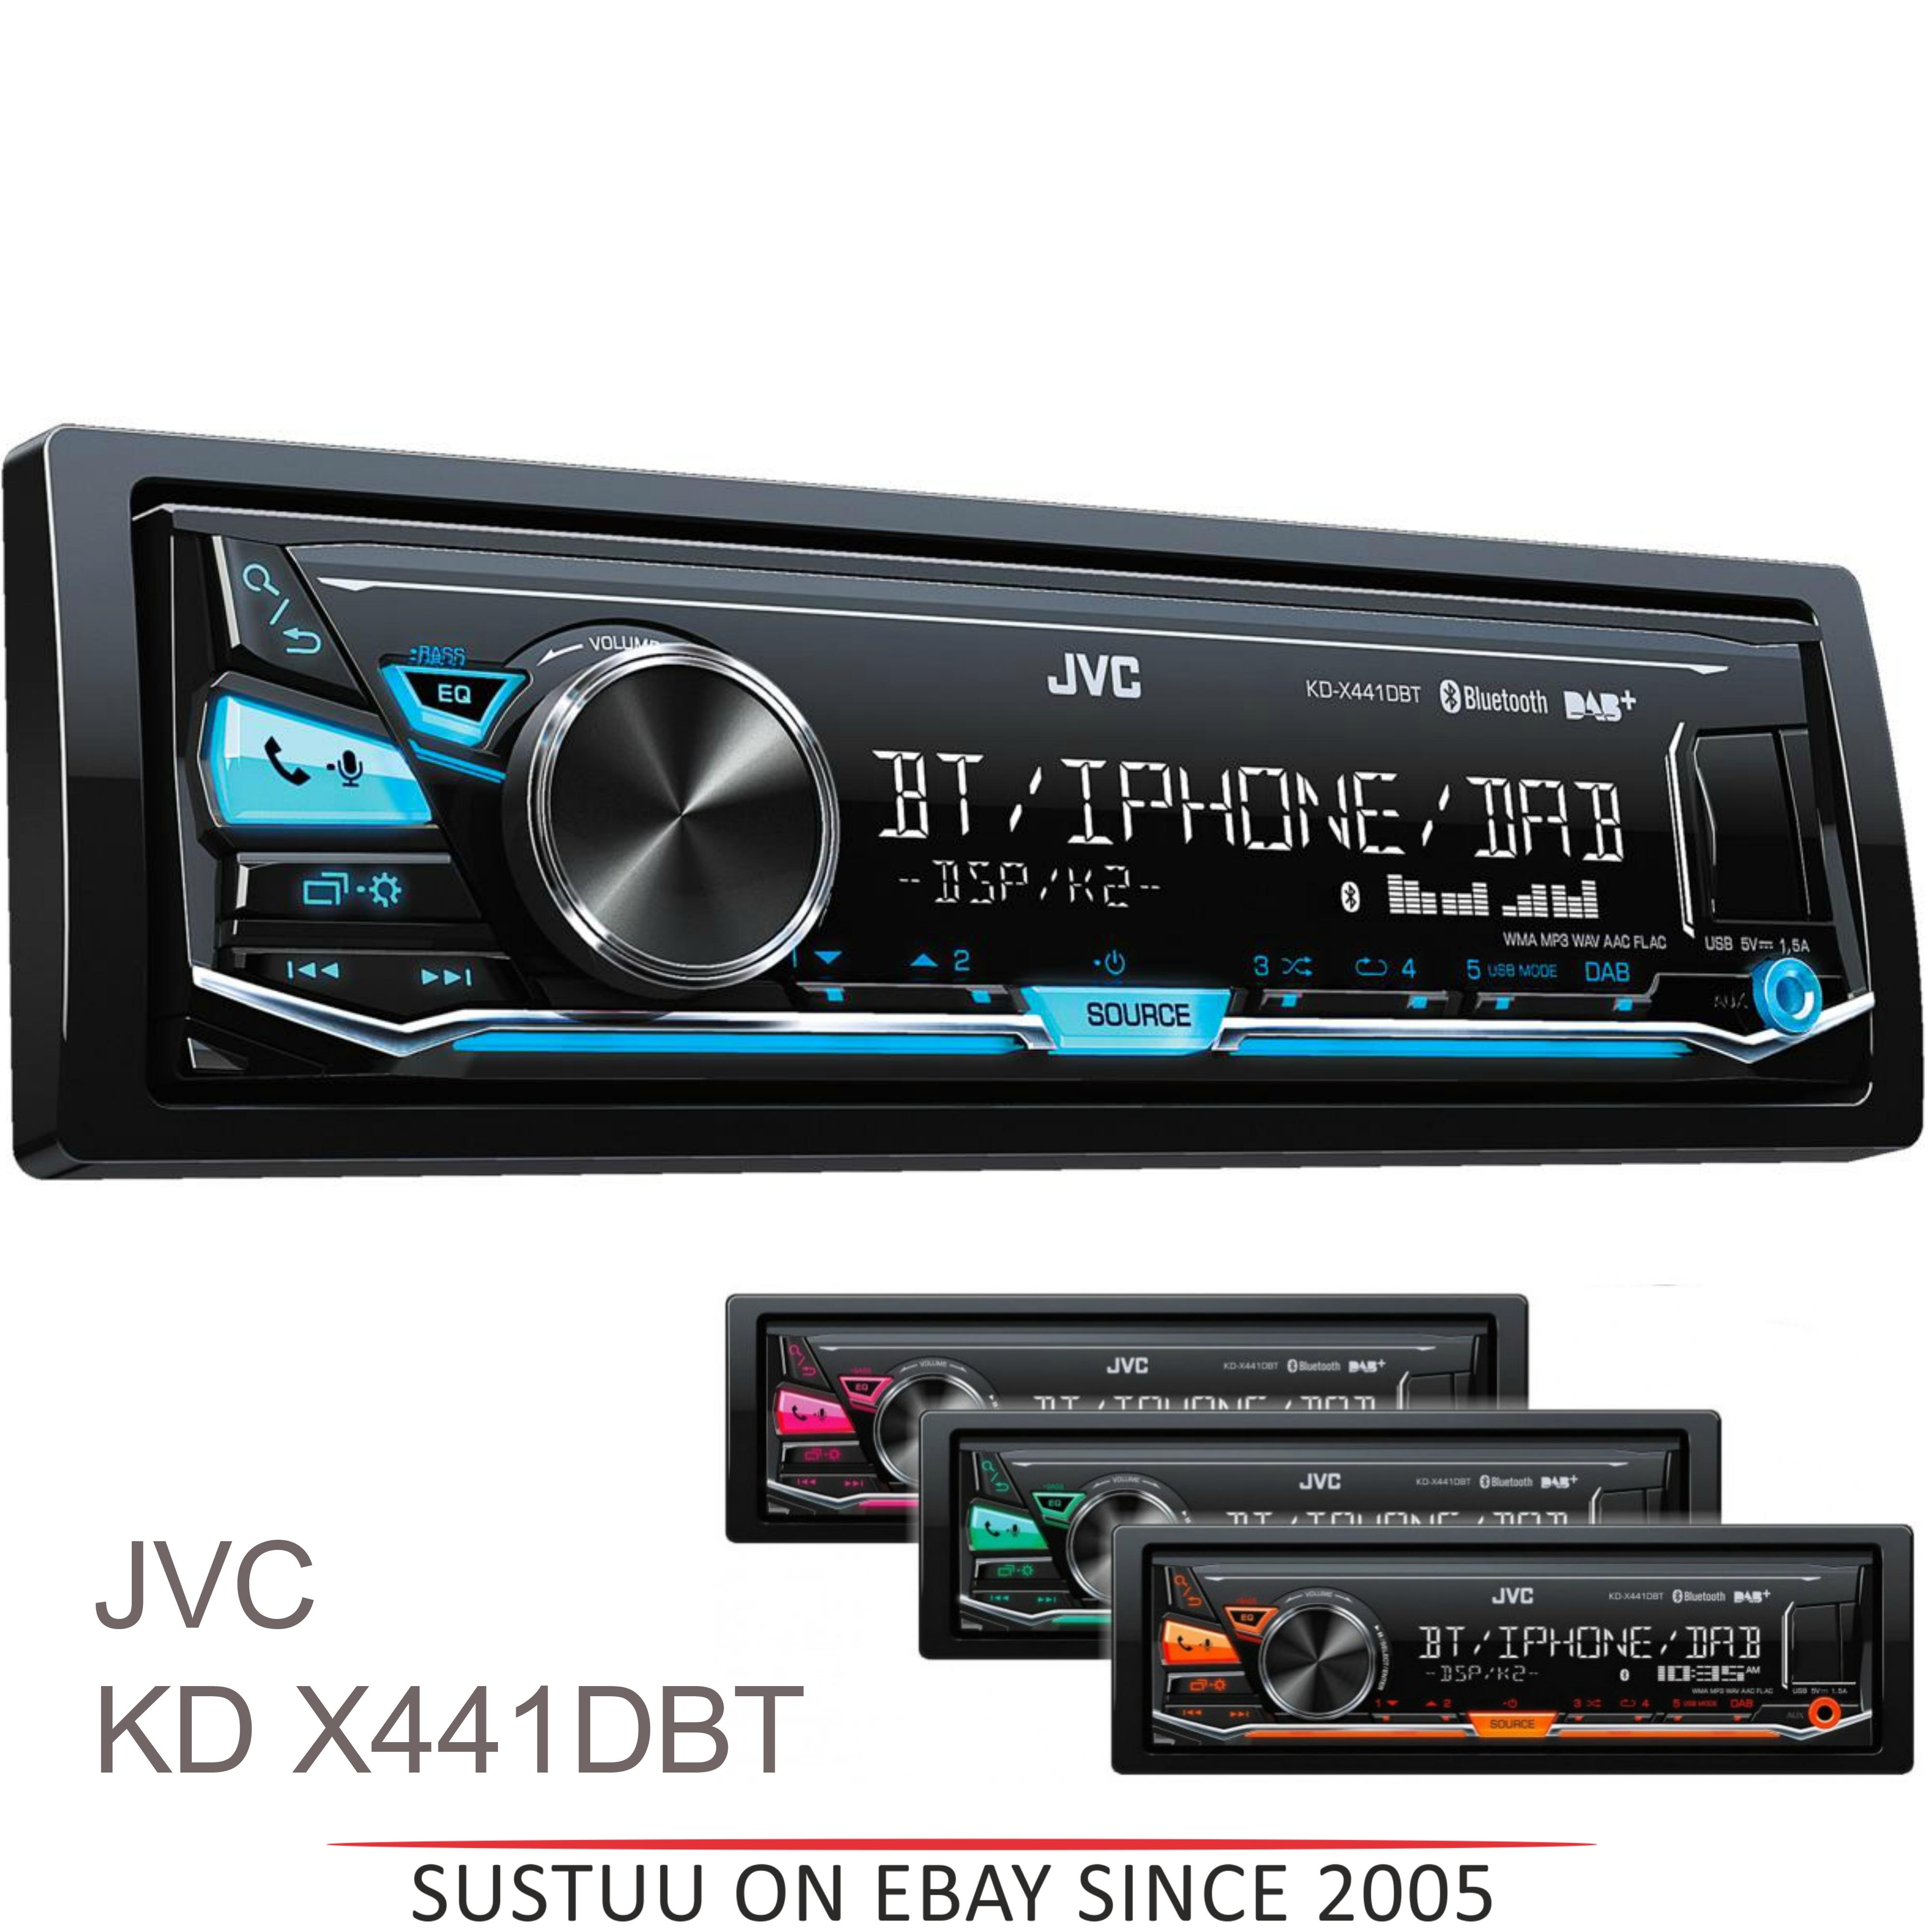 android jvc kd x441dbt car stereo dab am fm bluetooth usb. Black Bedroom Furniture Sets. Home Design Ideas